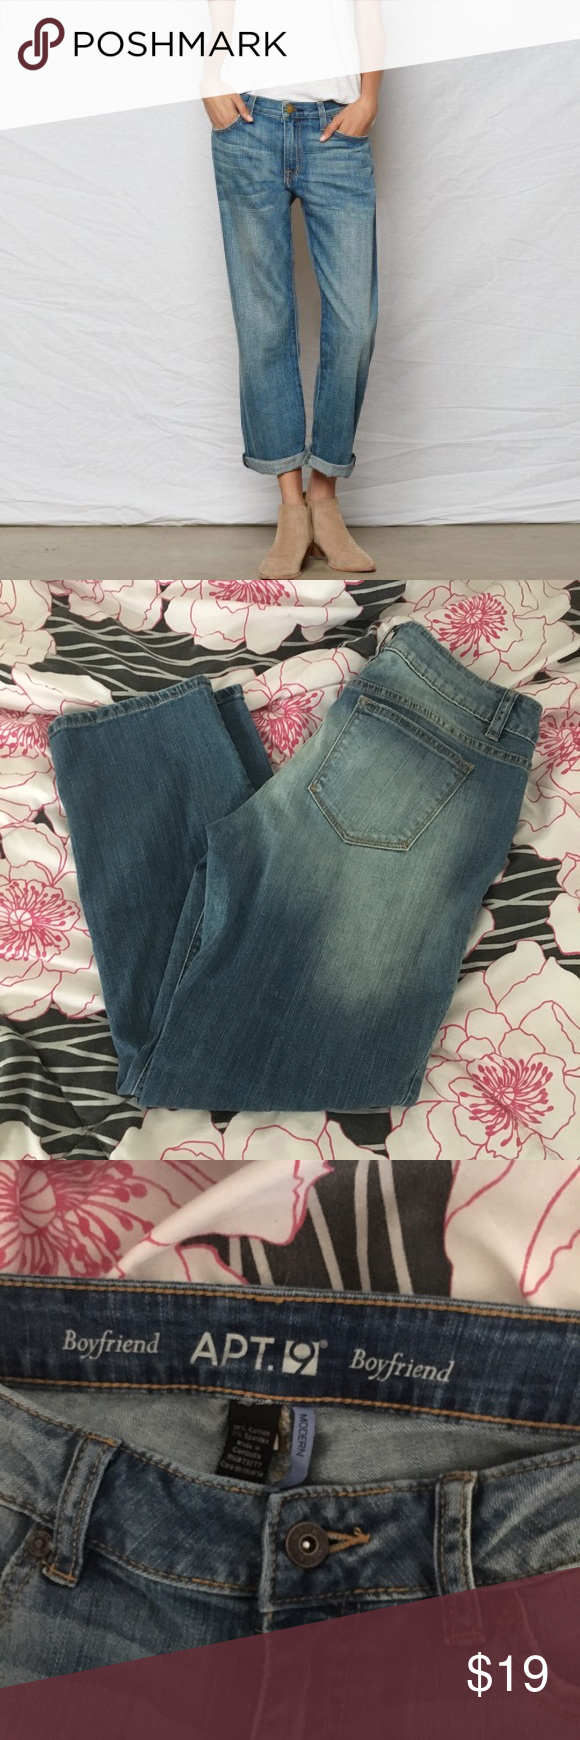 Boyfriend jeans New without tags. Apt. 9 Jeans Boyfriend